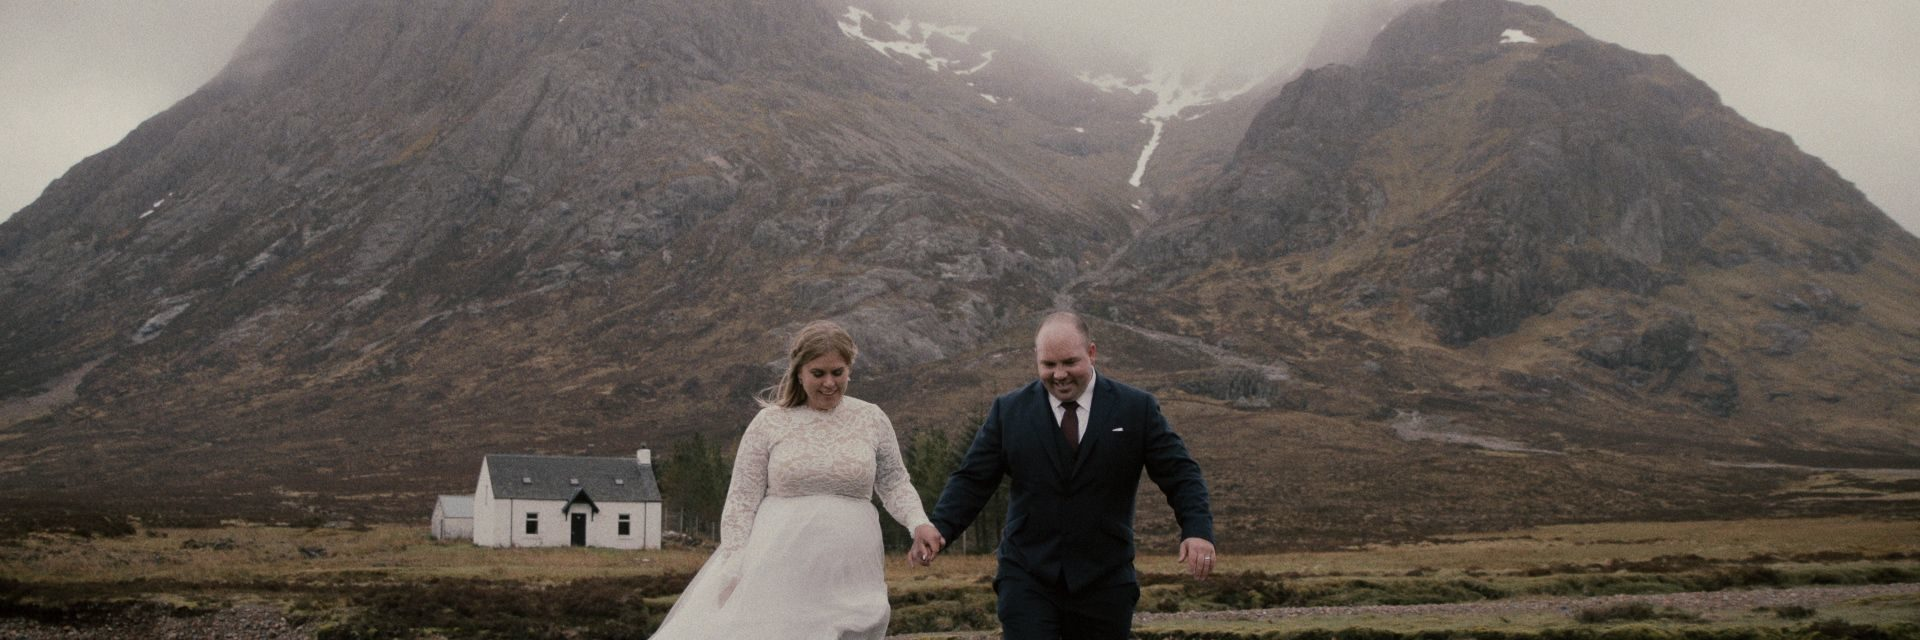 Glencoe-elopement-videographer-cinemate-films-03